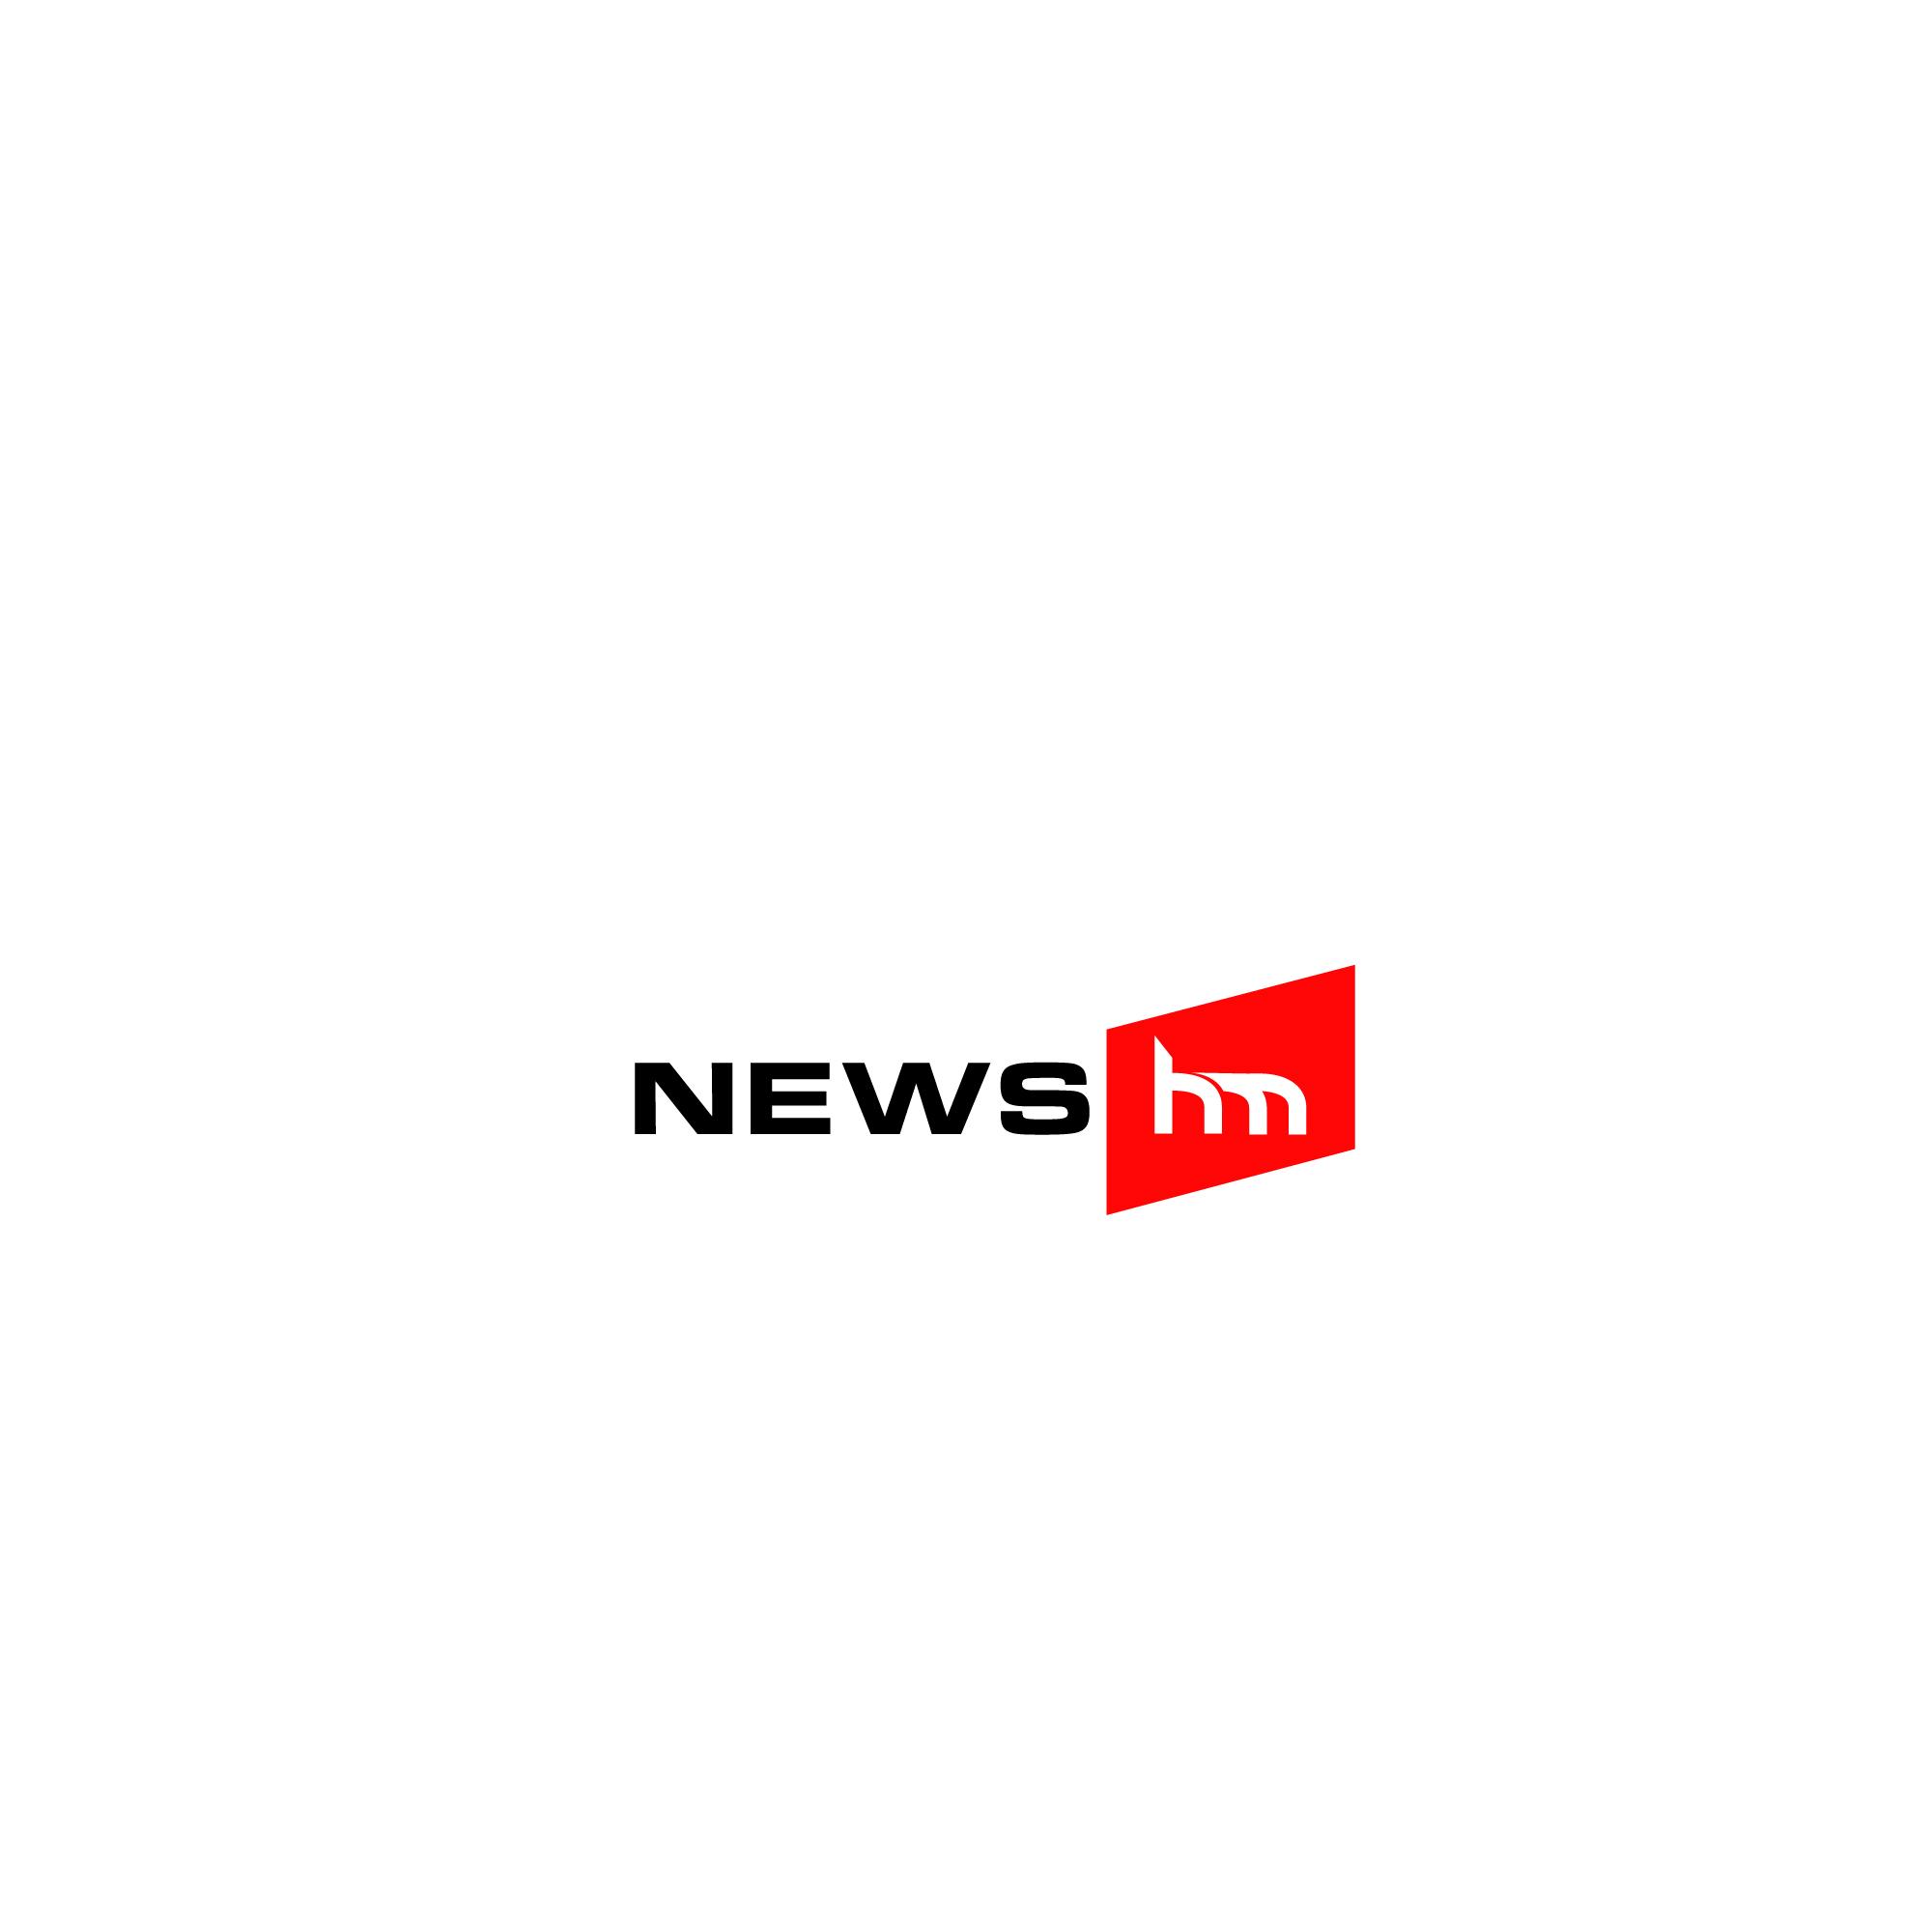 Логотип для информационного агентства фото f_9415aa2b0a7a48e6.jpg